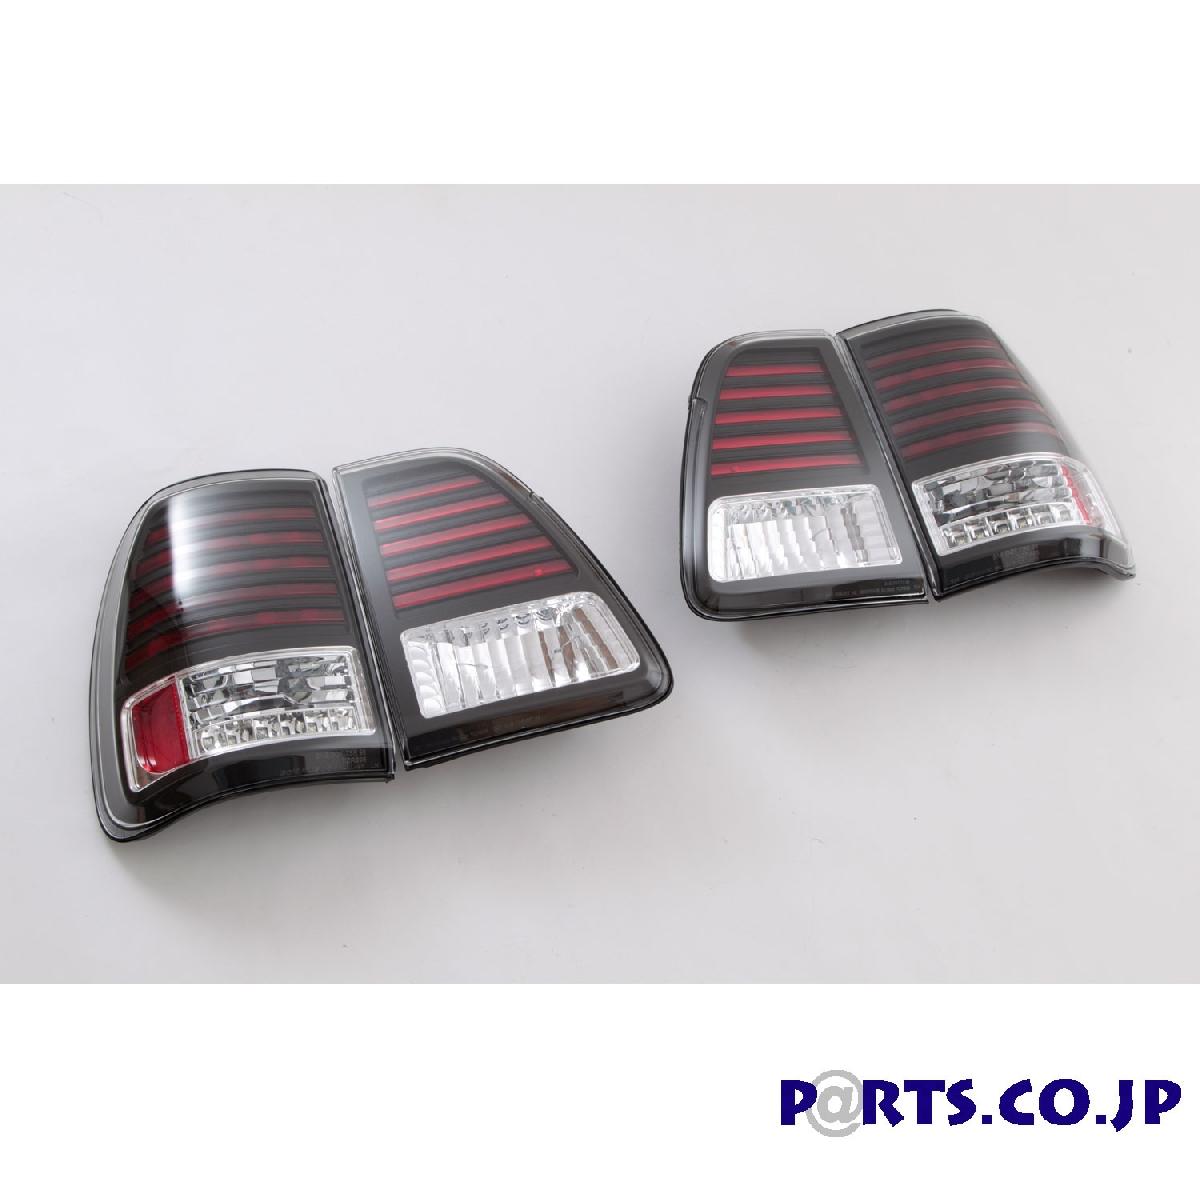 SONAR ソナー 海外限定 テールライト 日時指定 トヨタ ランドクルーザー 100系 LEDテール 98-07 ランクル ブラック